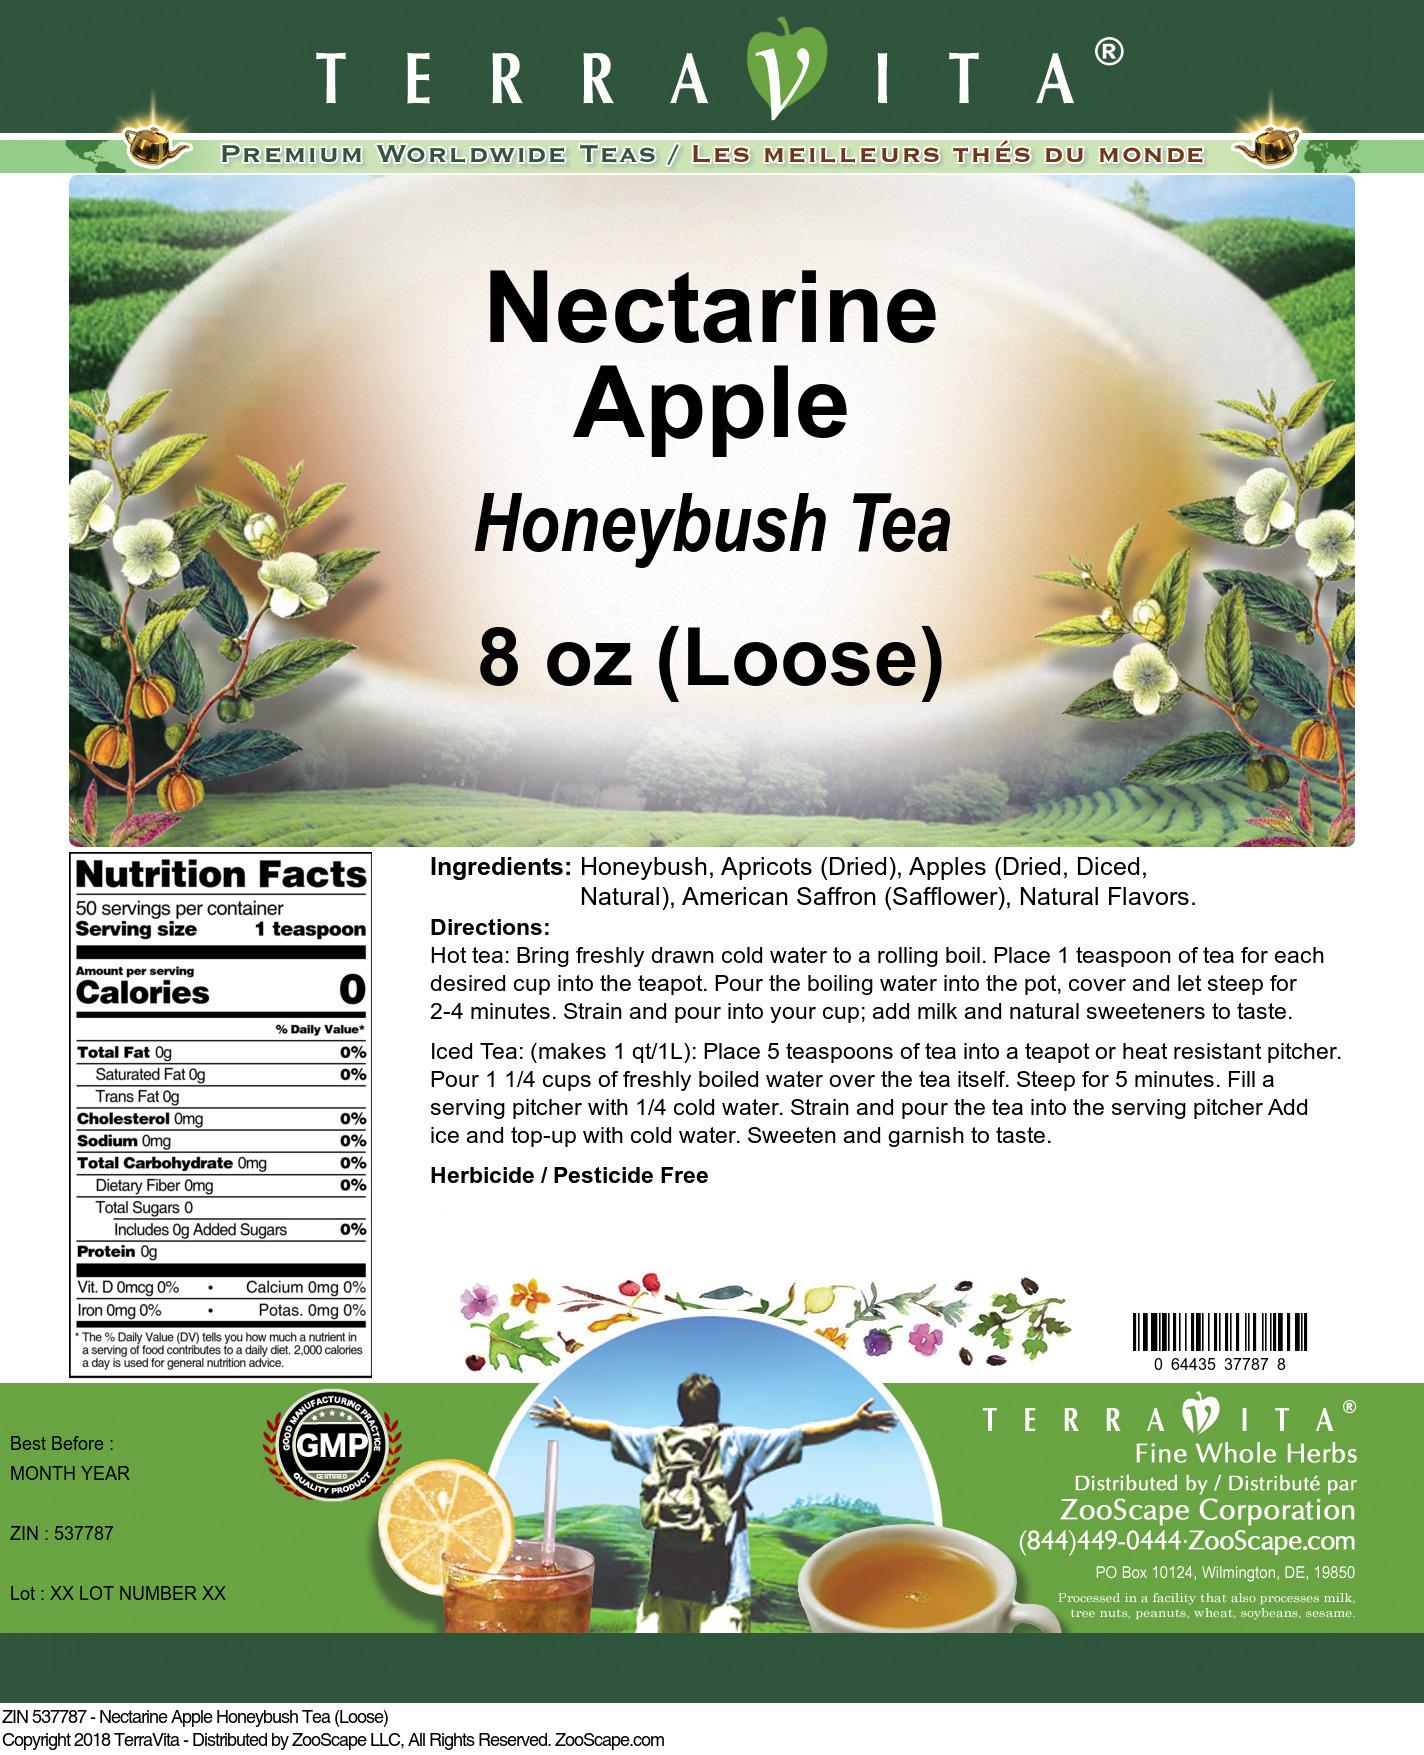 Nectarine Apple Honeybush Tea (Loose)